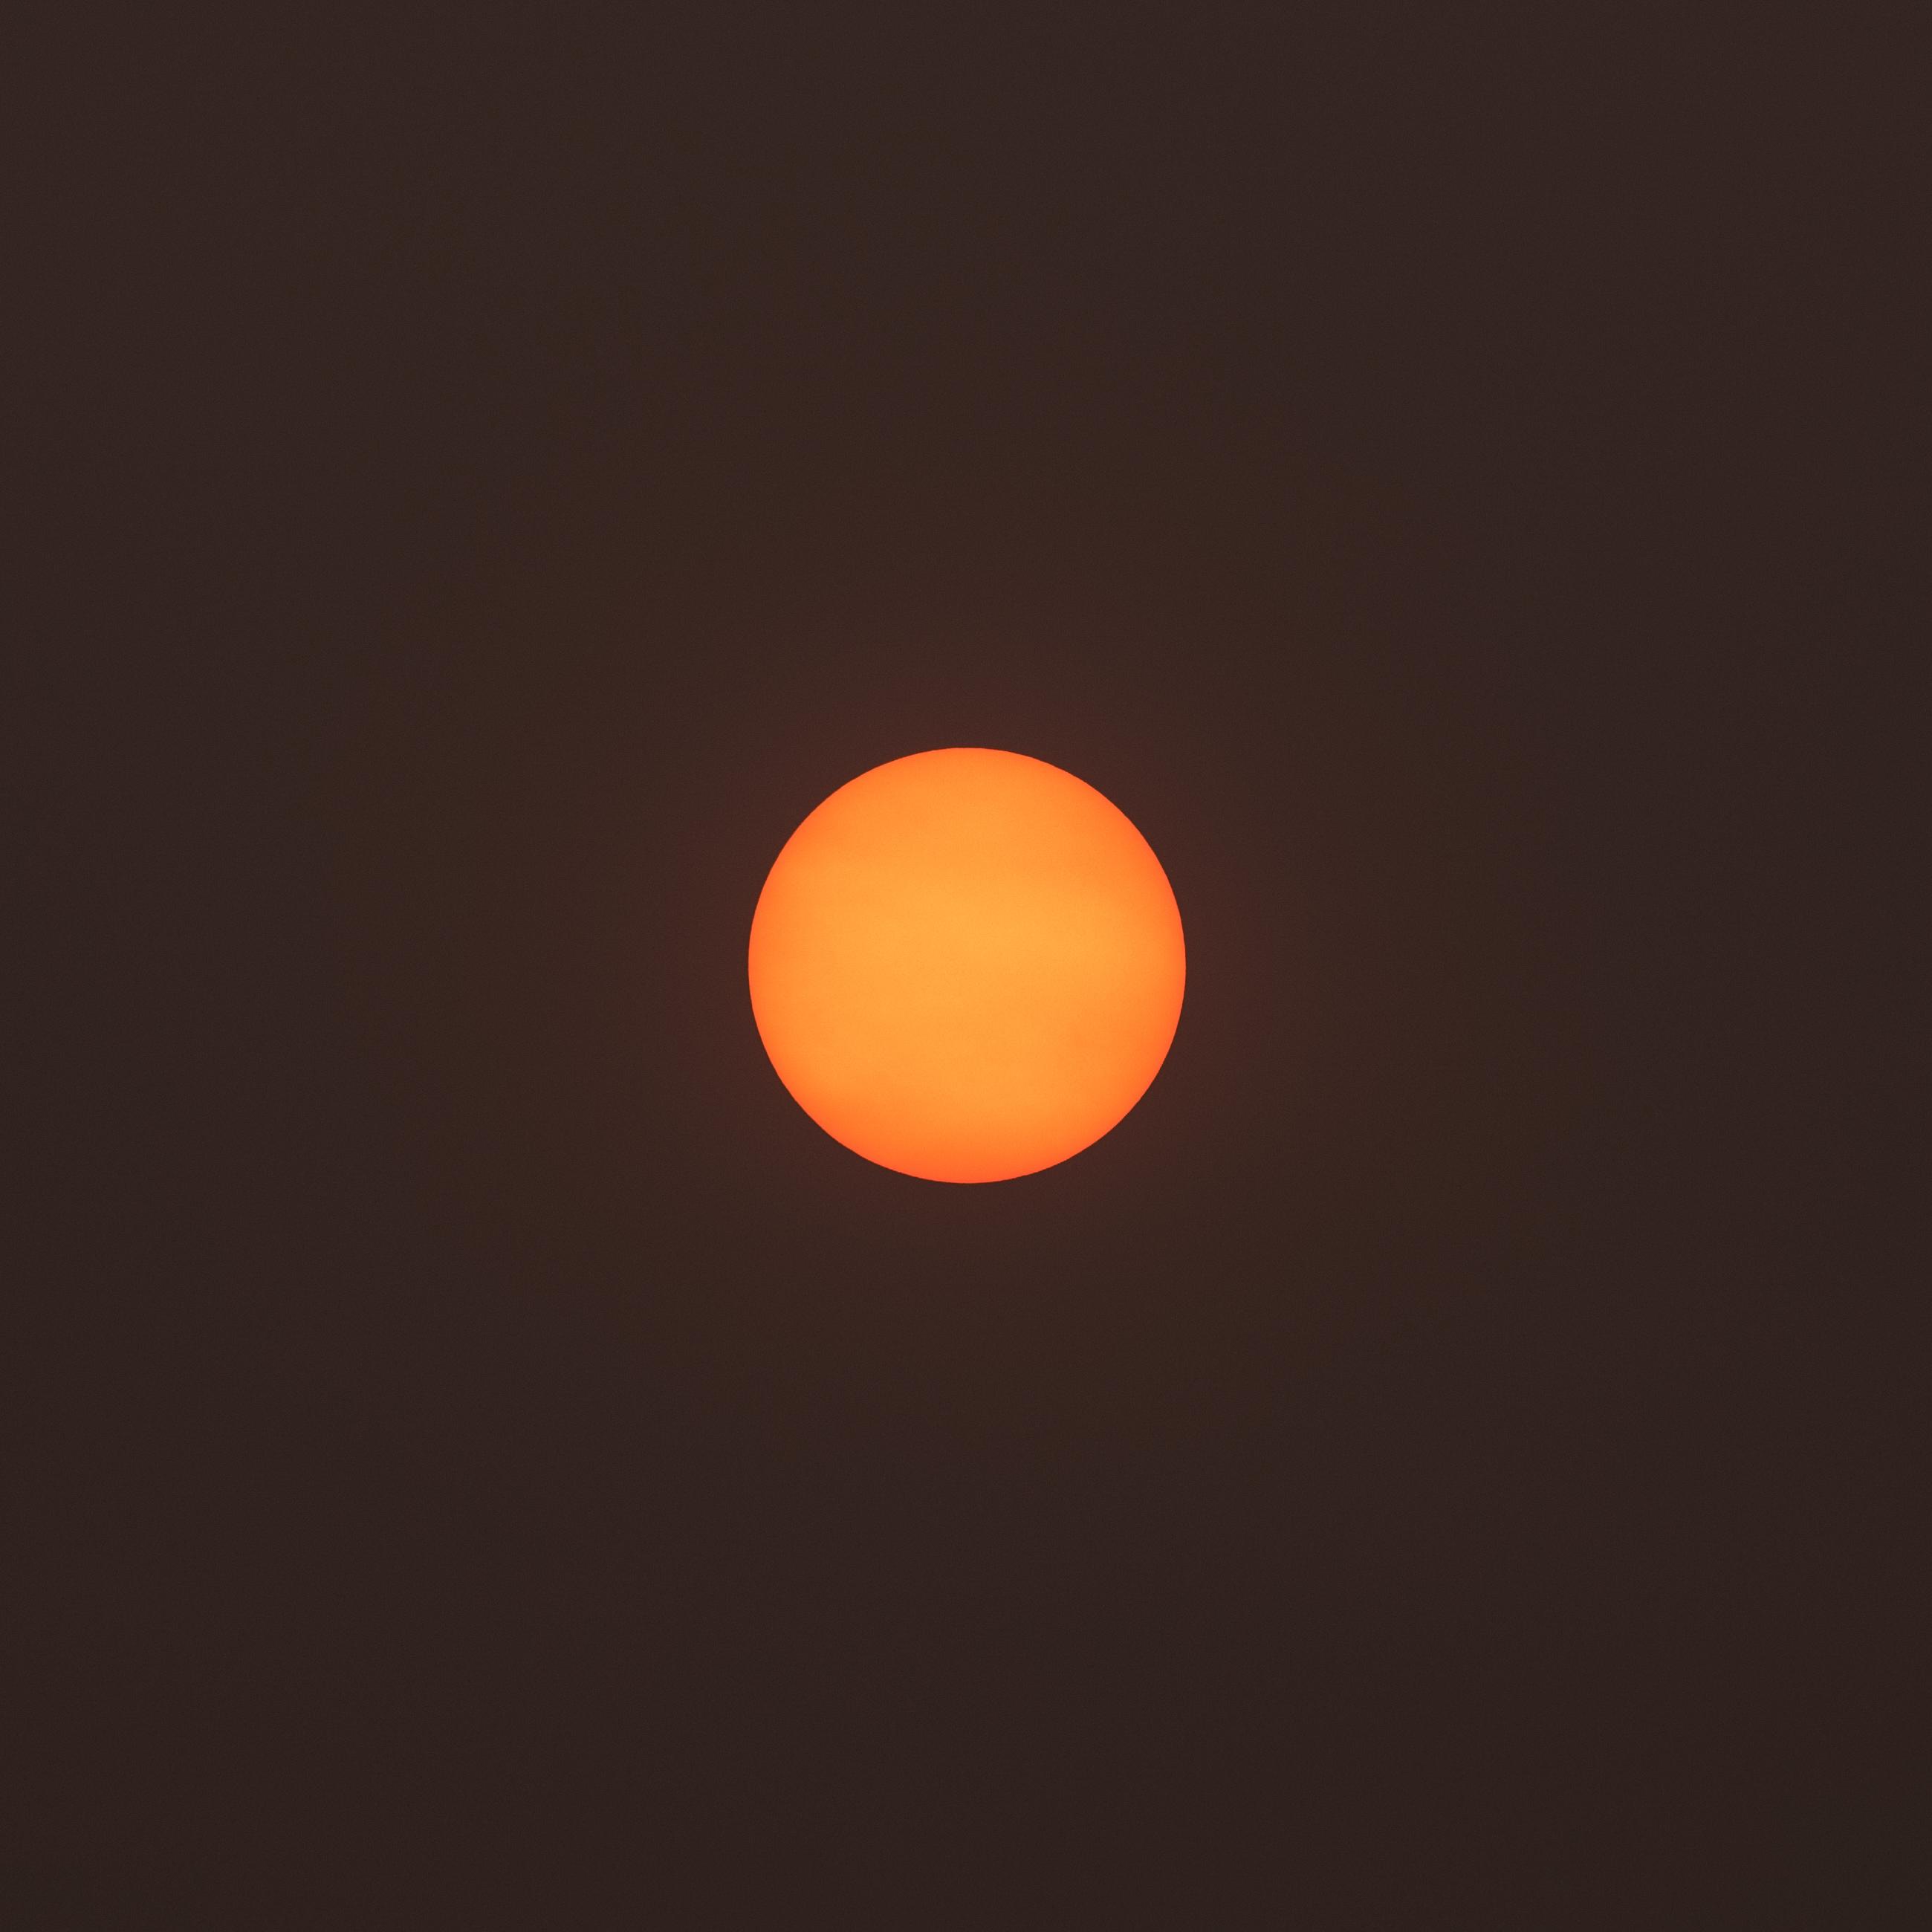 9/11 @ 7:31am. 69 degrees. Smokey.